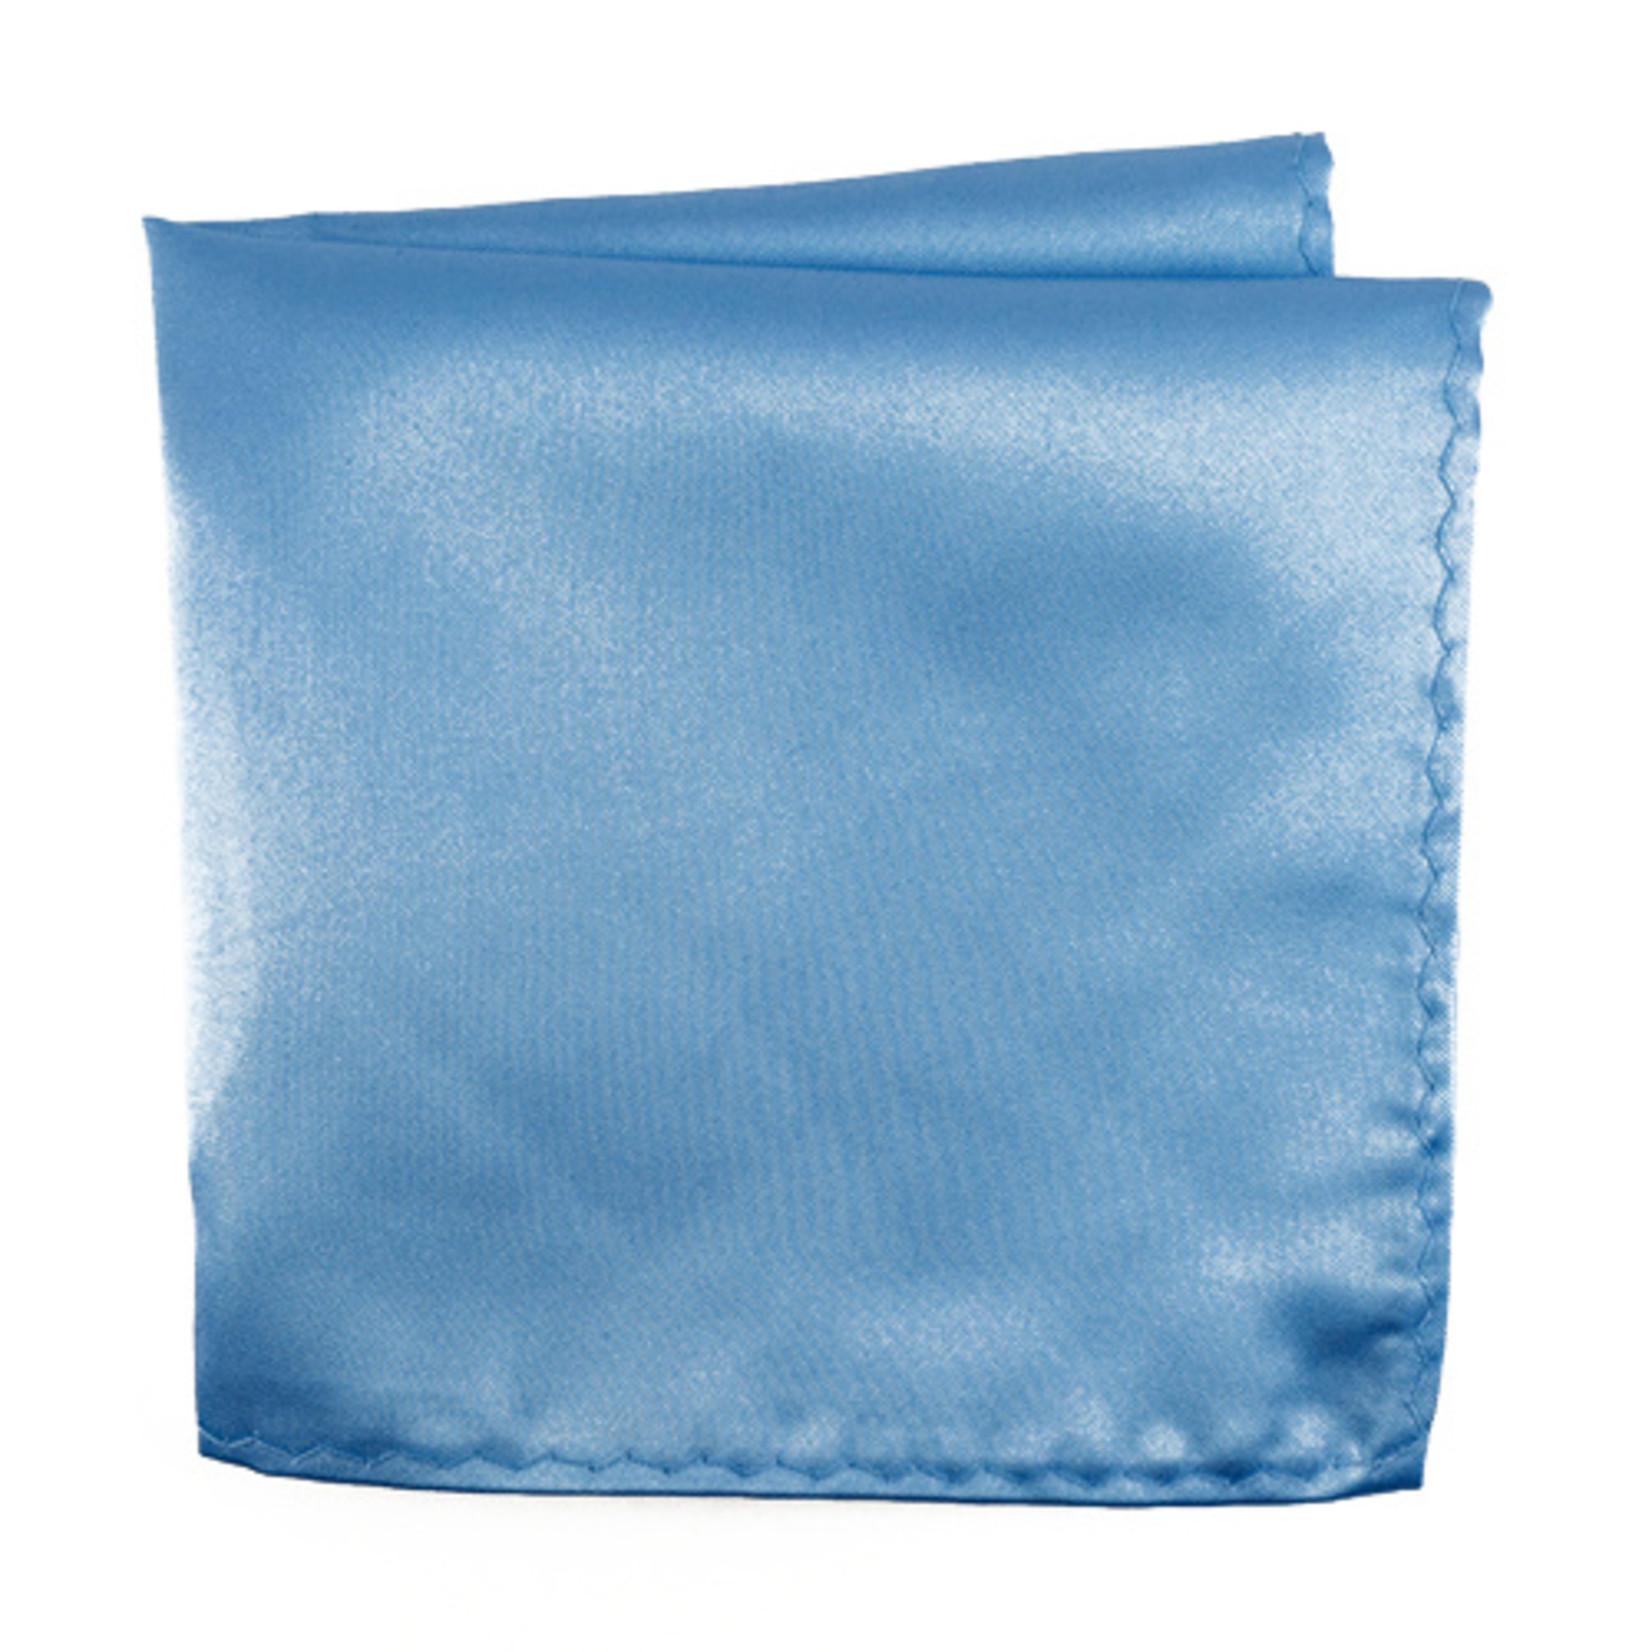 Knotz M100PSQ-12 Solid Blue Pocket Square